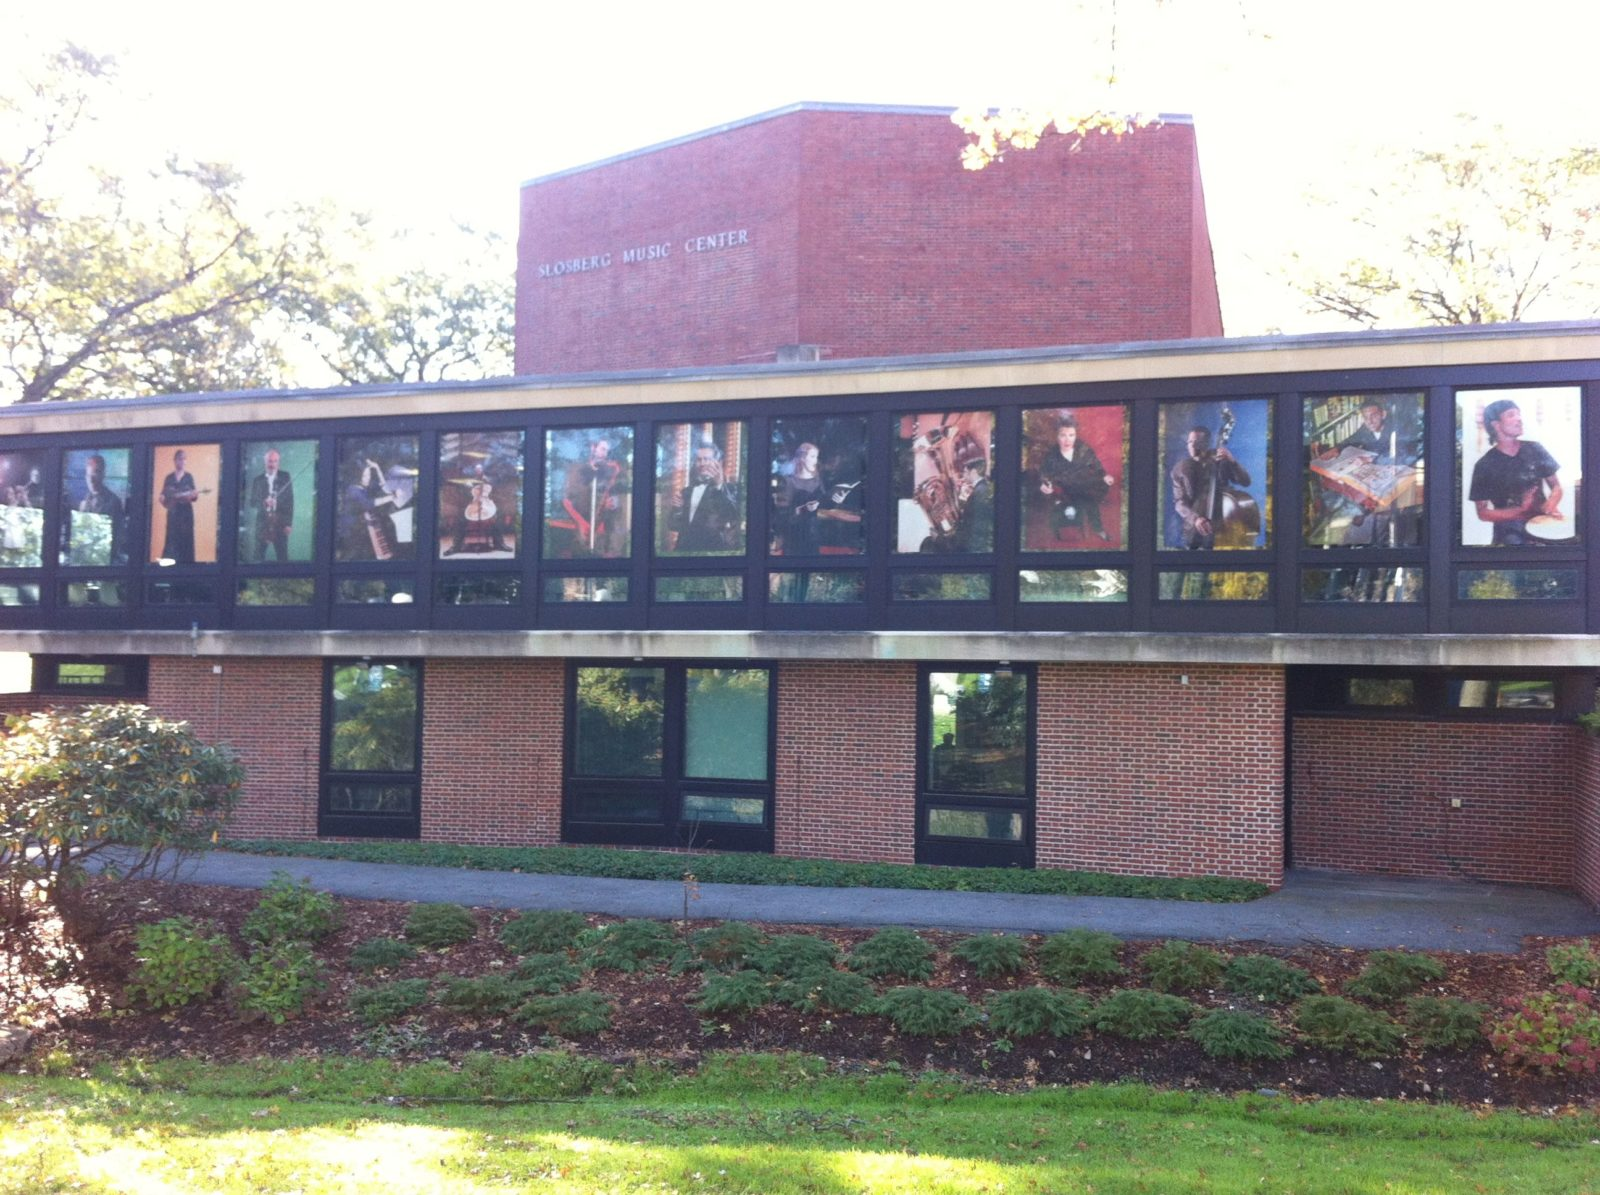 brandeis college window cling graphics